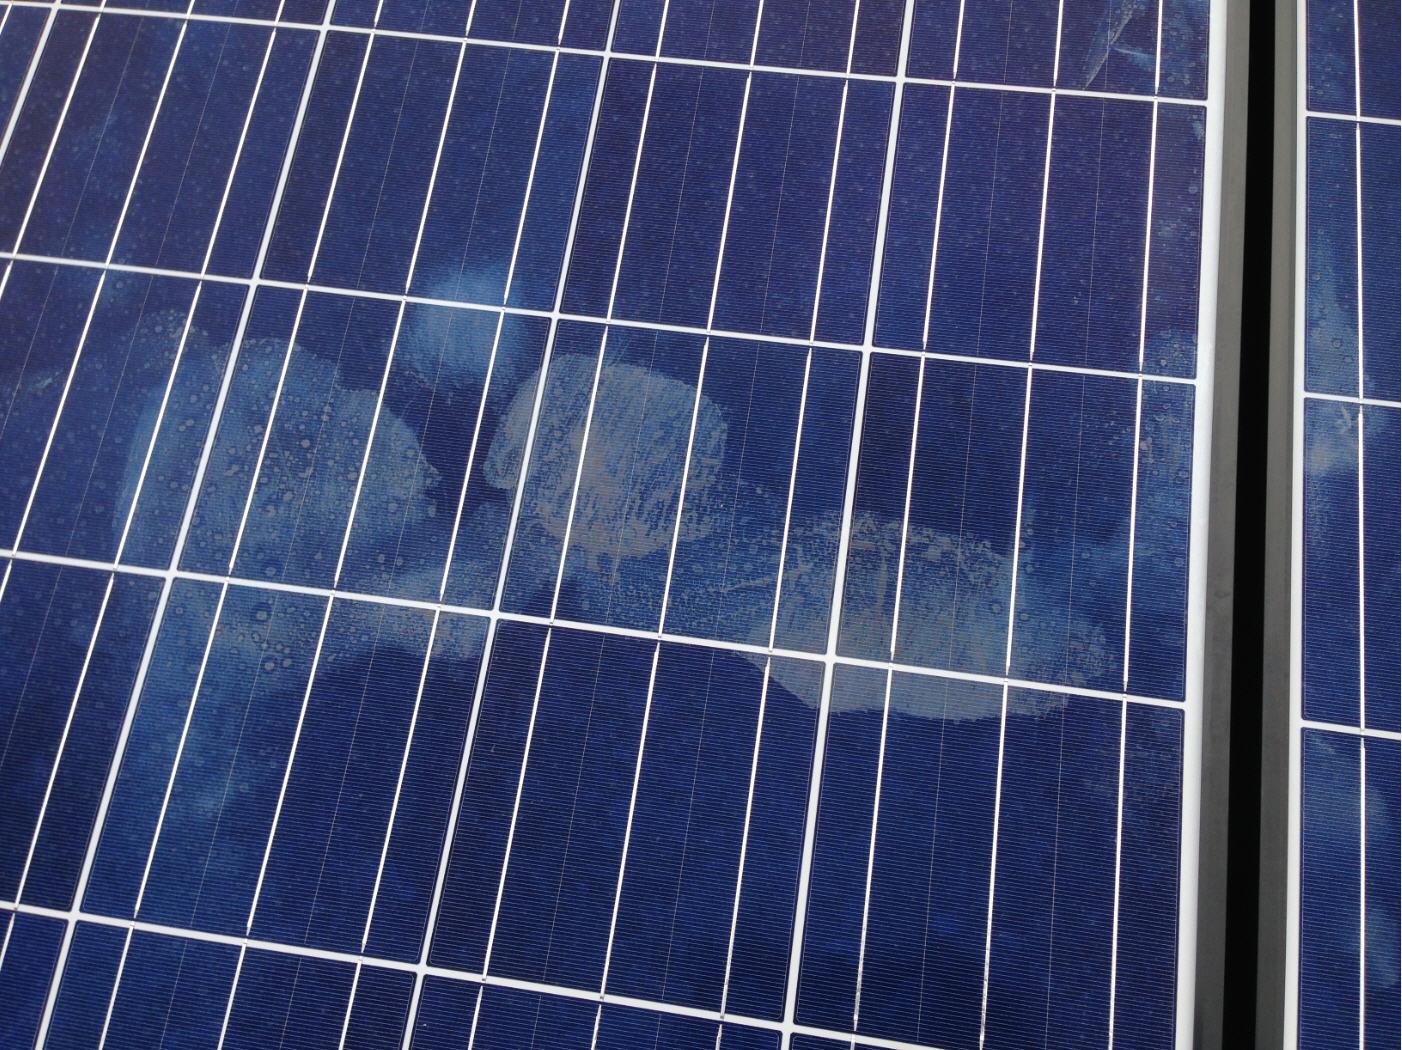 solarpanel3.jpg